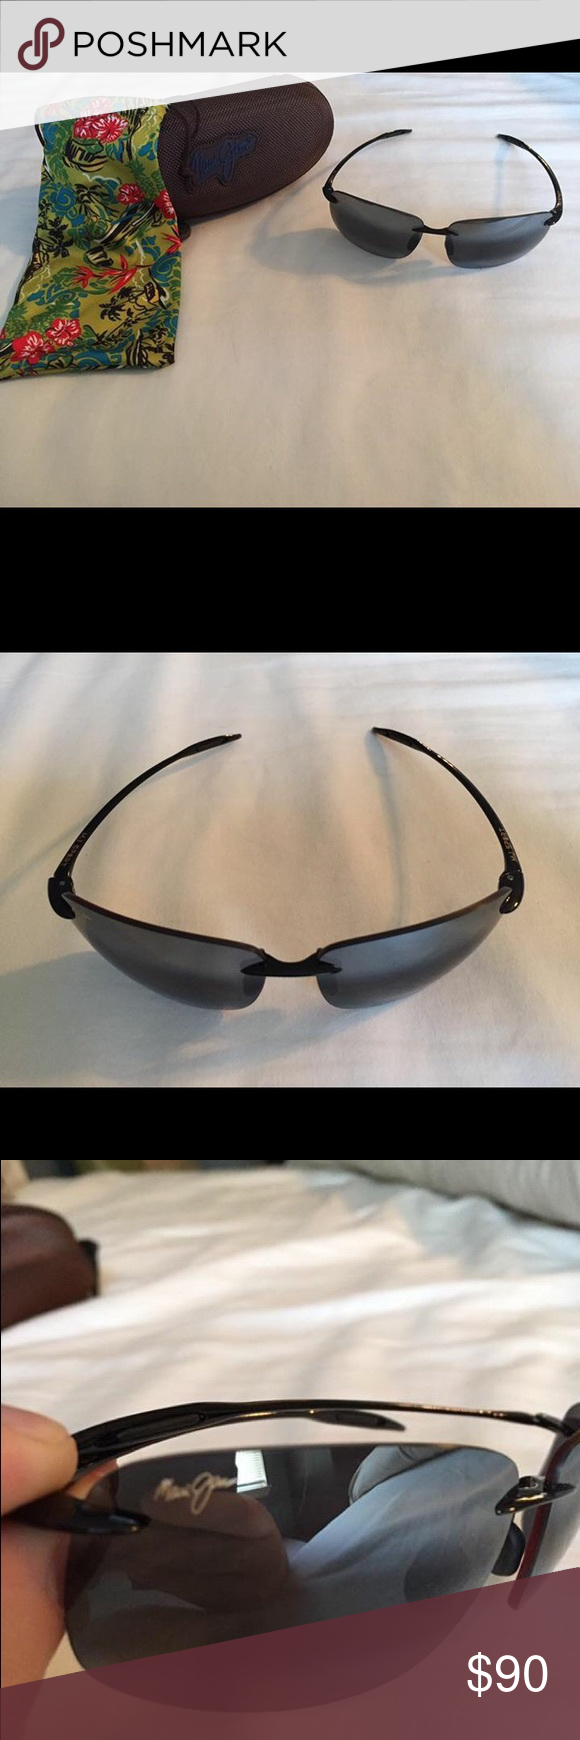 Maui Jim sport line sunglasses Brand new, includes hard shell case and soft fabric bag Maui Jim Accessories Sunglasses